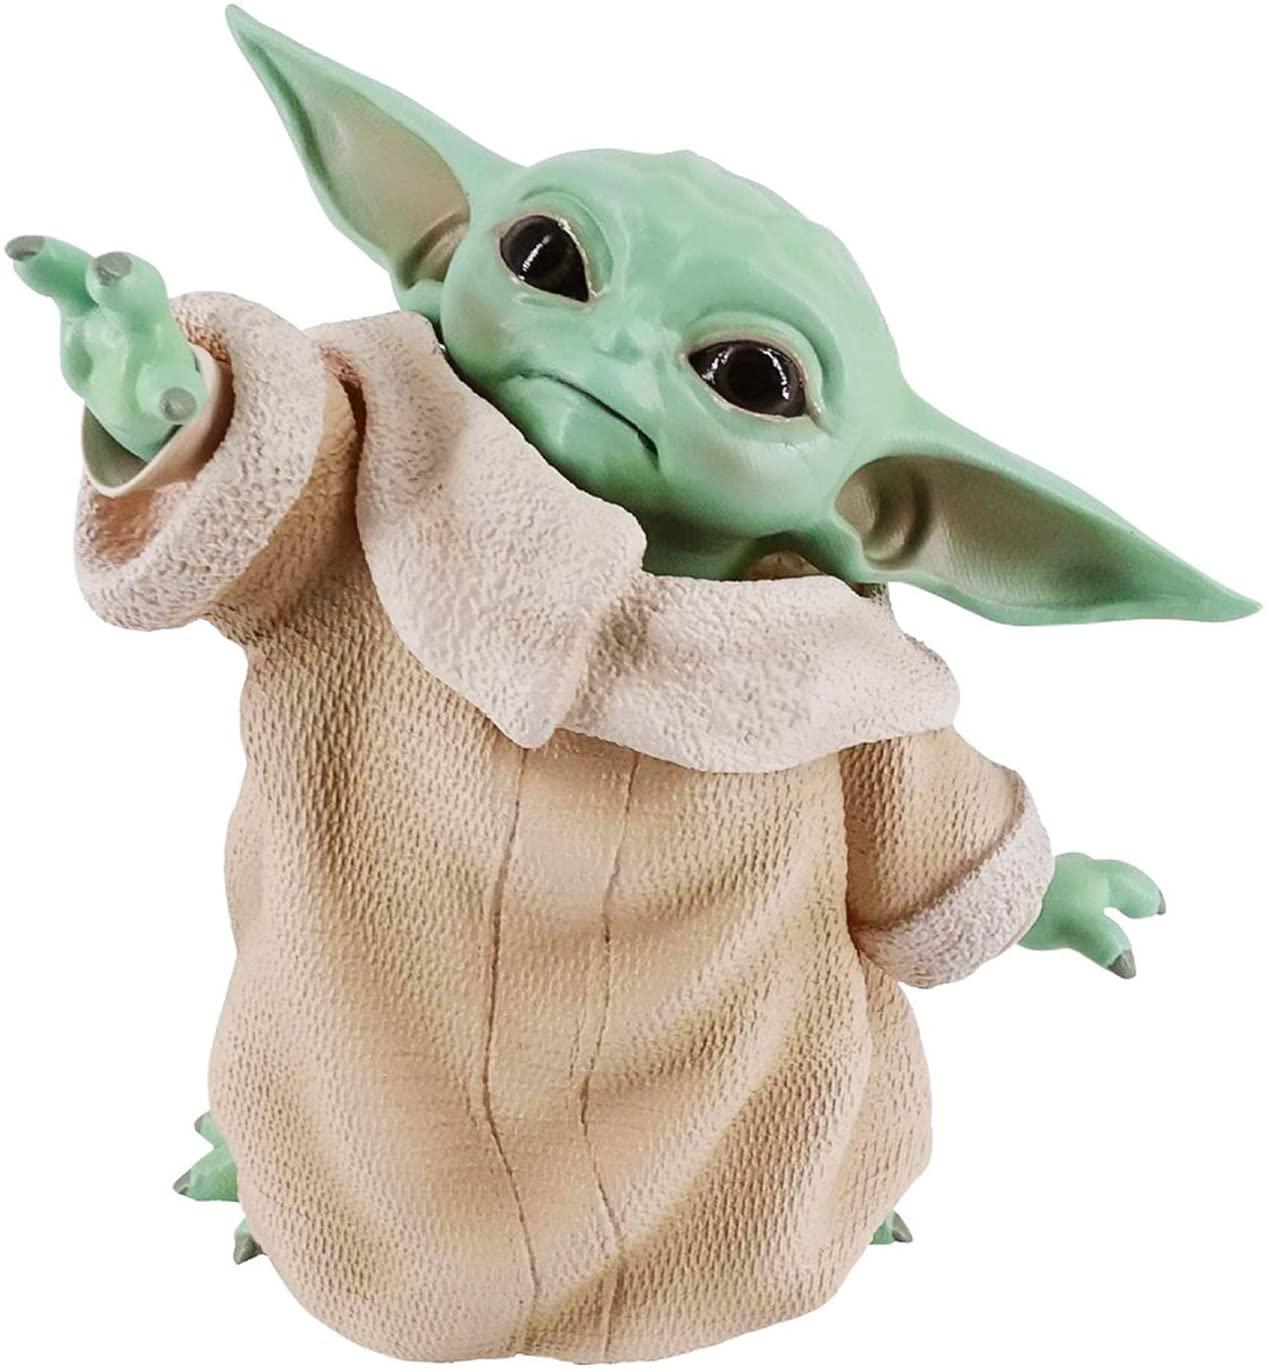 DUYUJIE Pop Star Wars The Child Animatronic Edition Mandalorian Baby Yoda Action Figure Toys